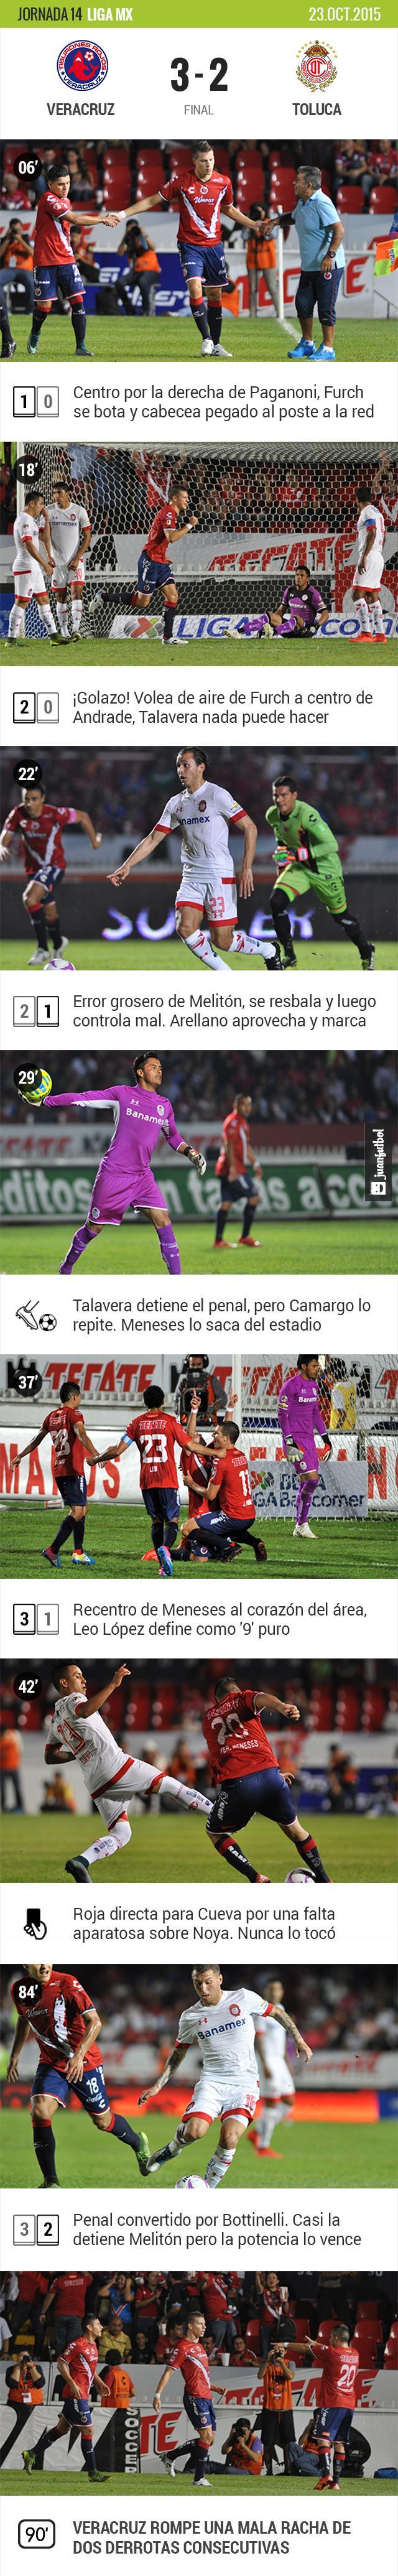 Veracruz 3-2 Toluca